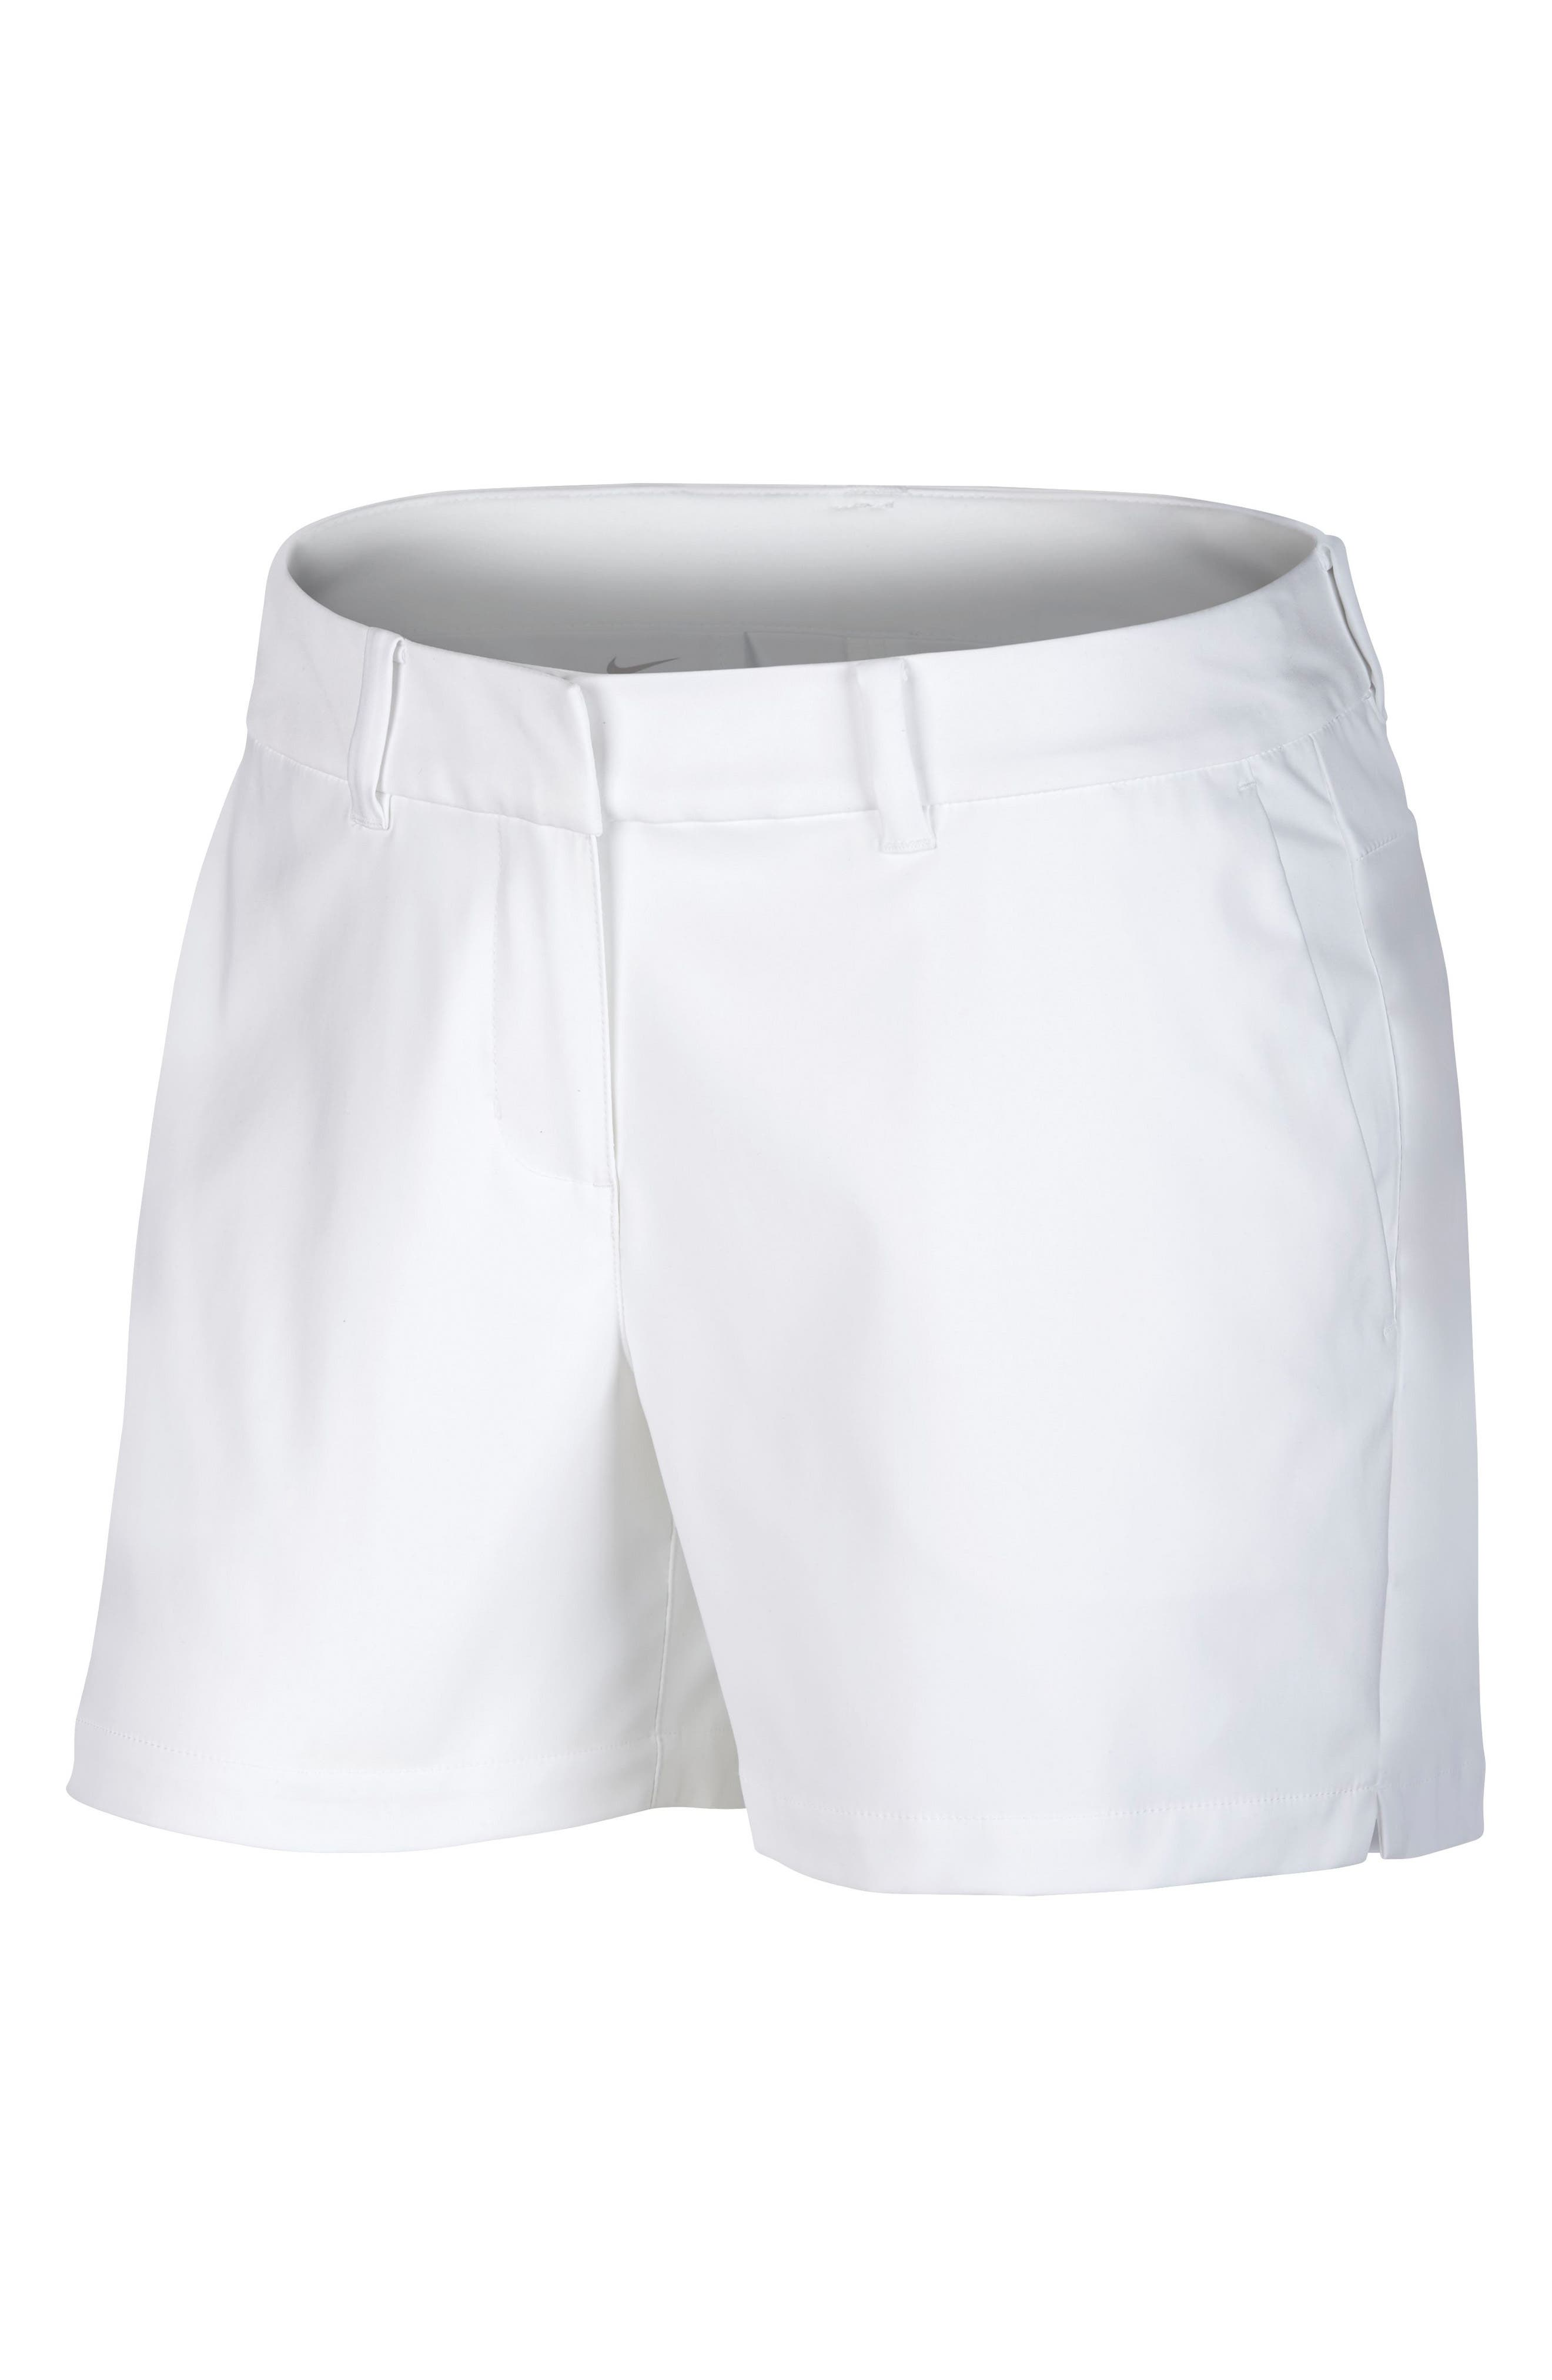 Flex Golf Shorts,                             Alternate thumbnail 4, color,                             100